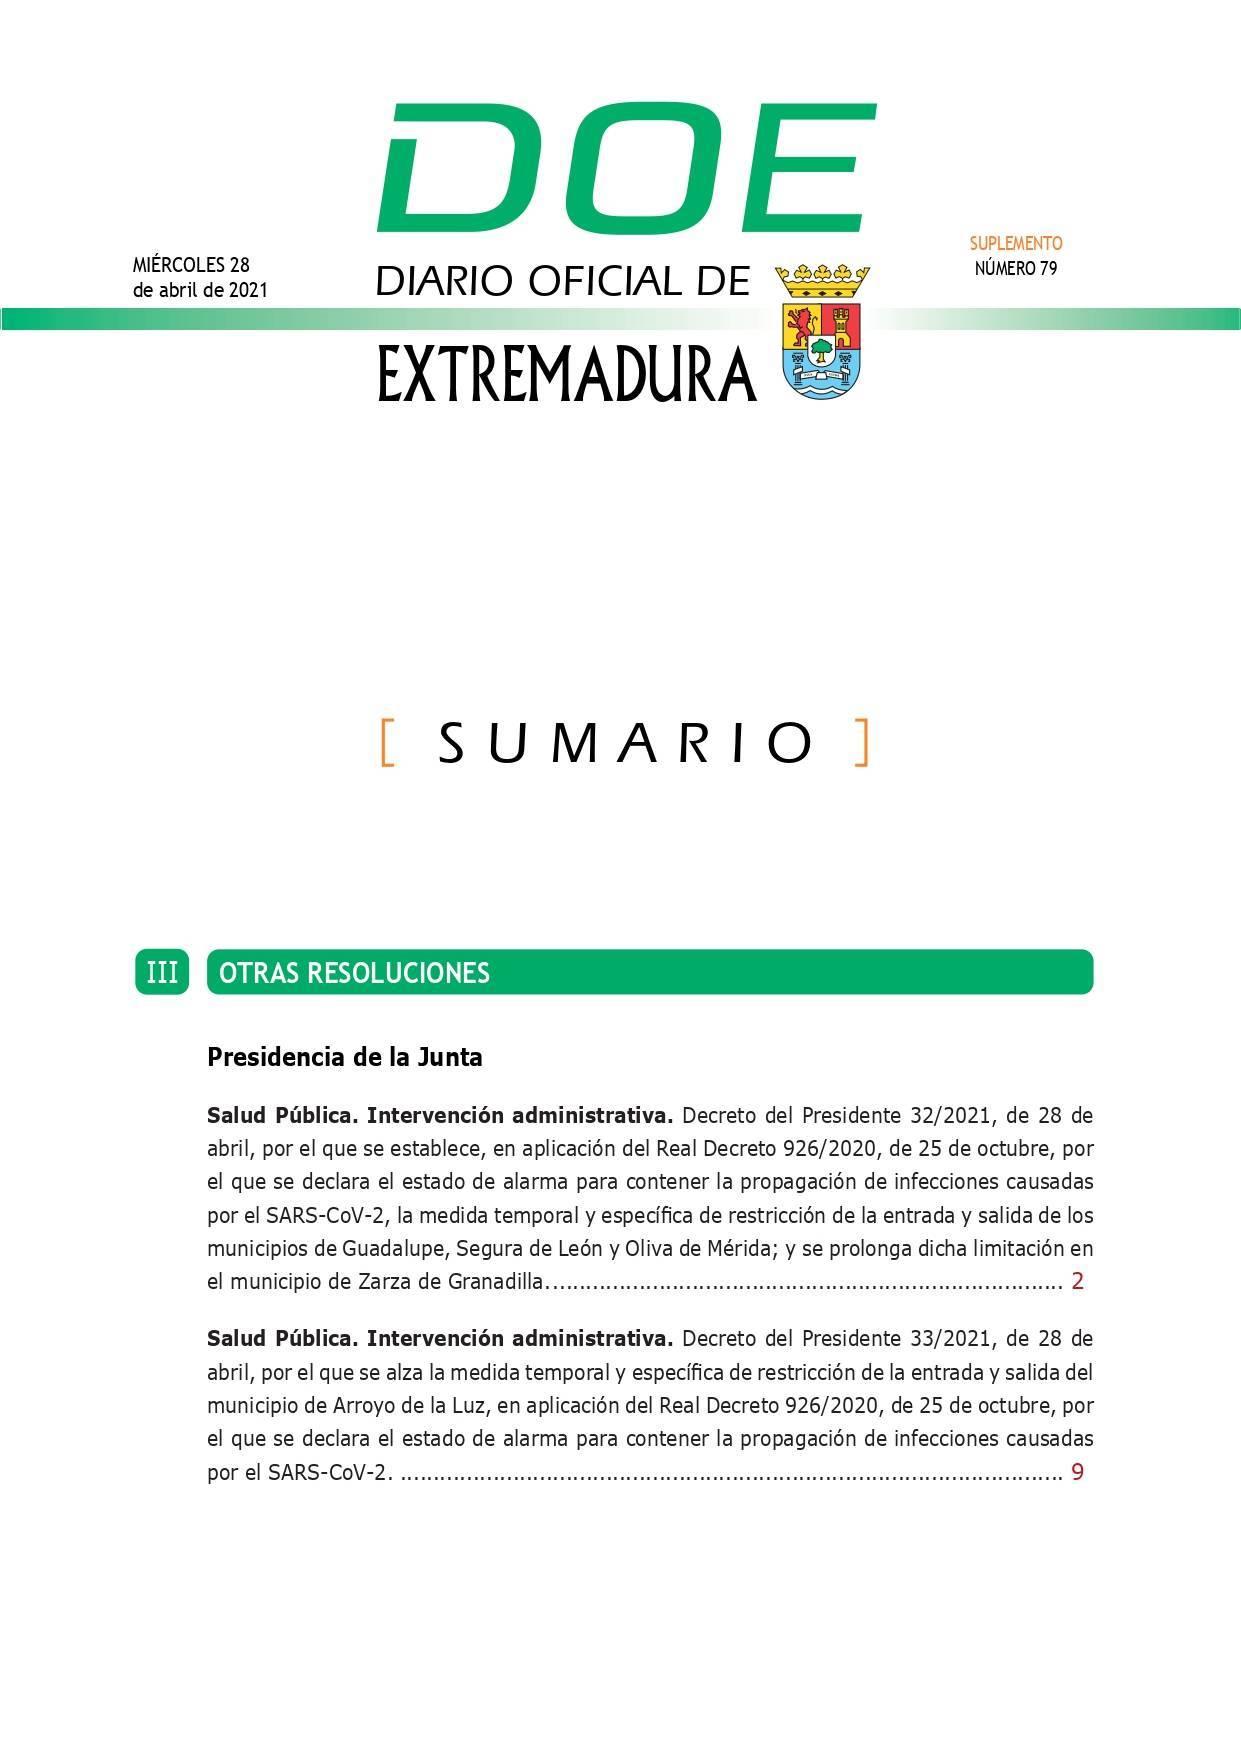 Cierre perimetral por COVID-19 (abril 2021) - Guadalupe (Cáceres) 1